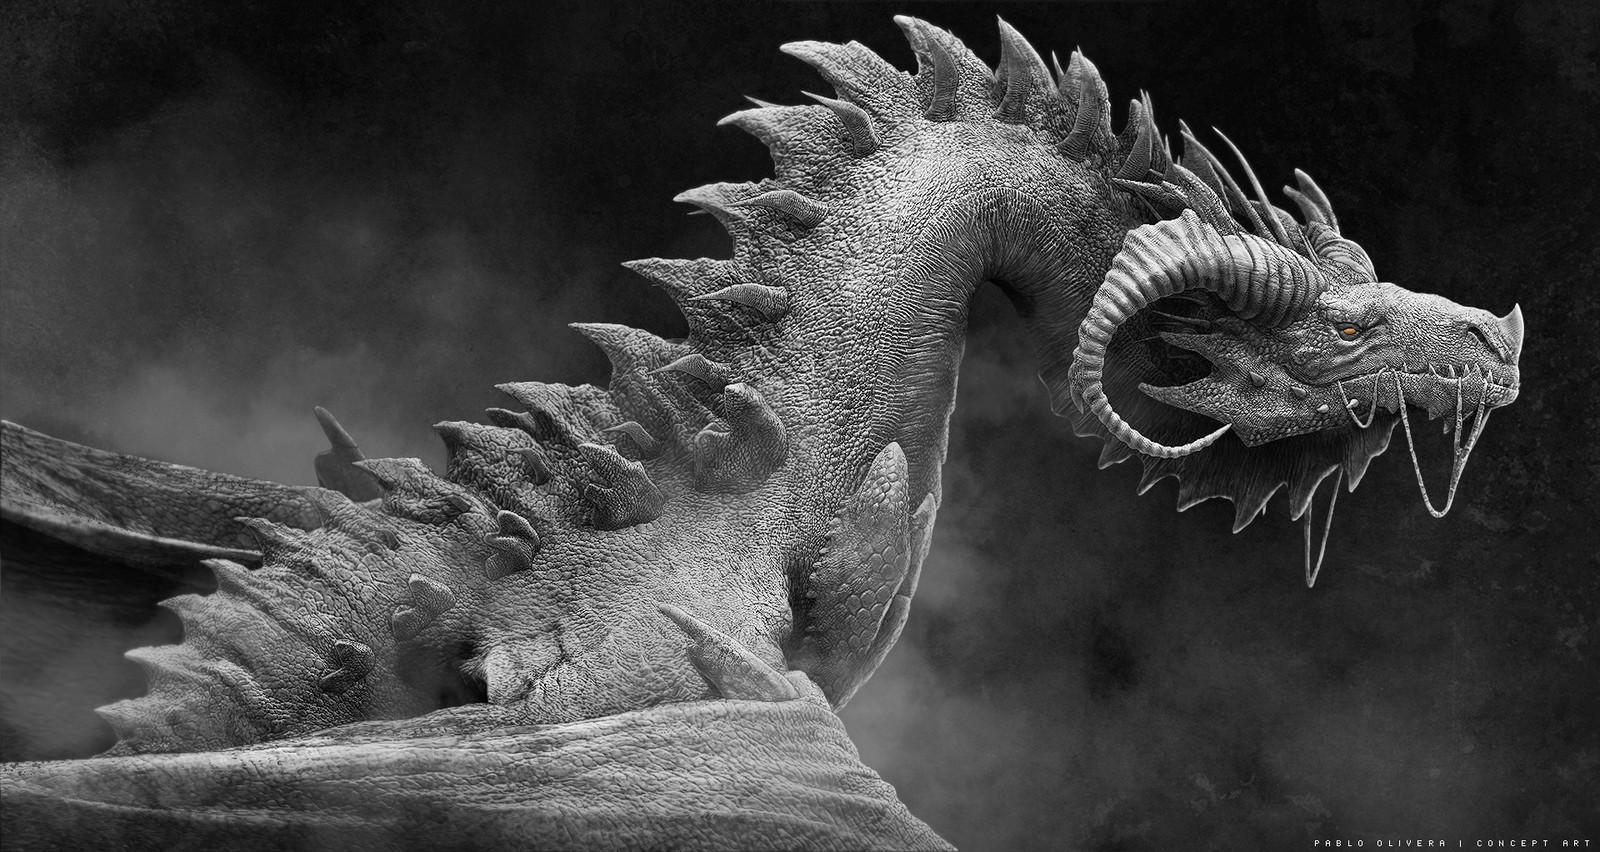 Dragon - 1st First place winner - Wacom contest